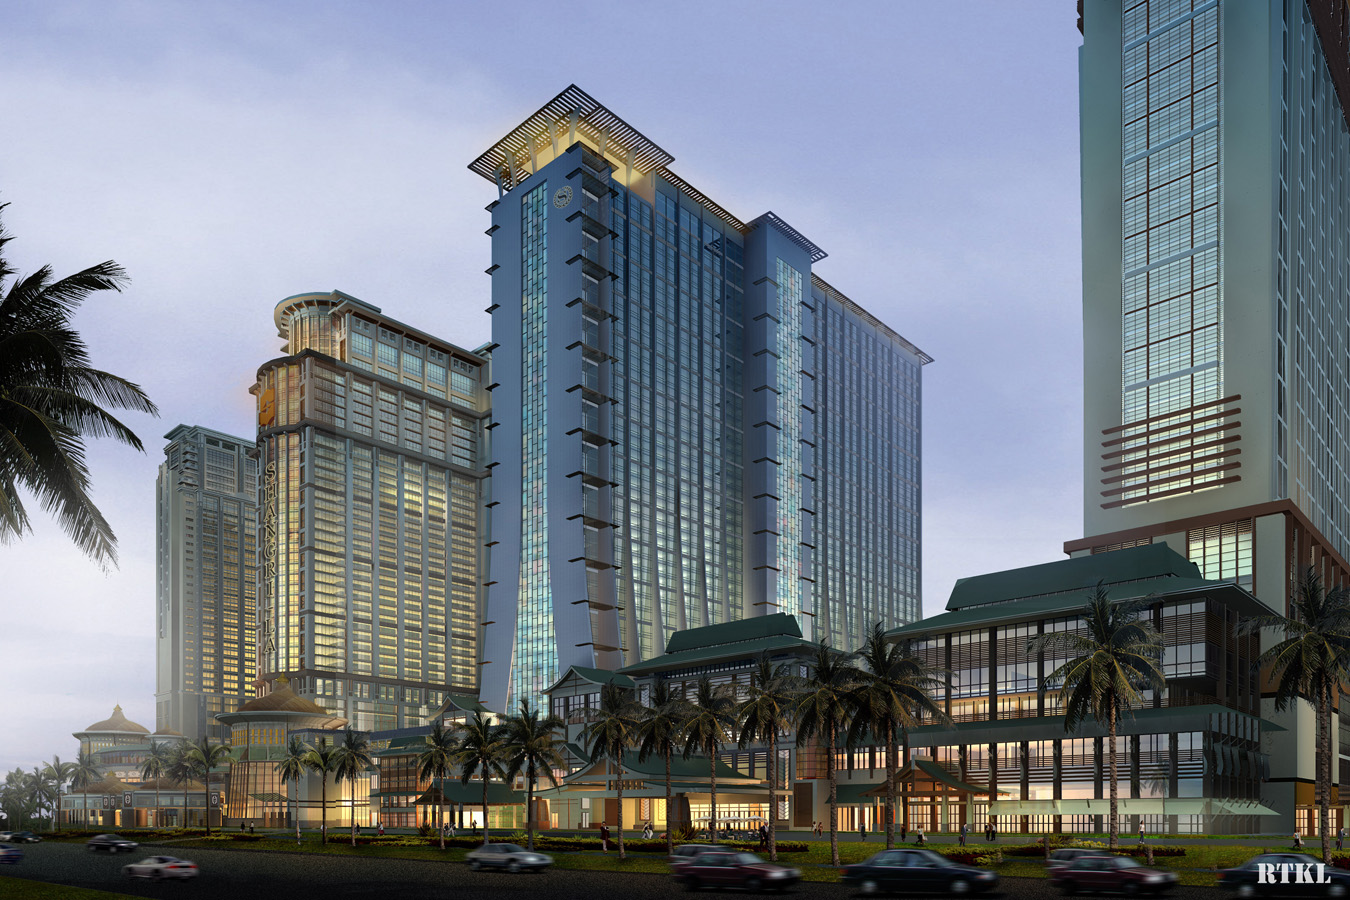 Budgeting for Hotel Reputation Management